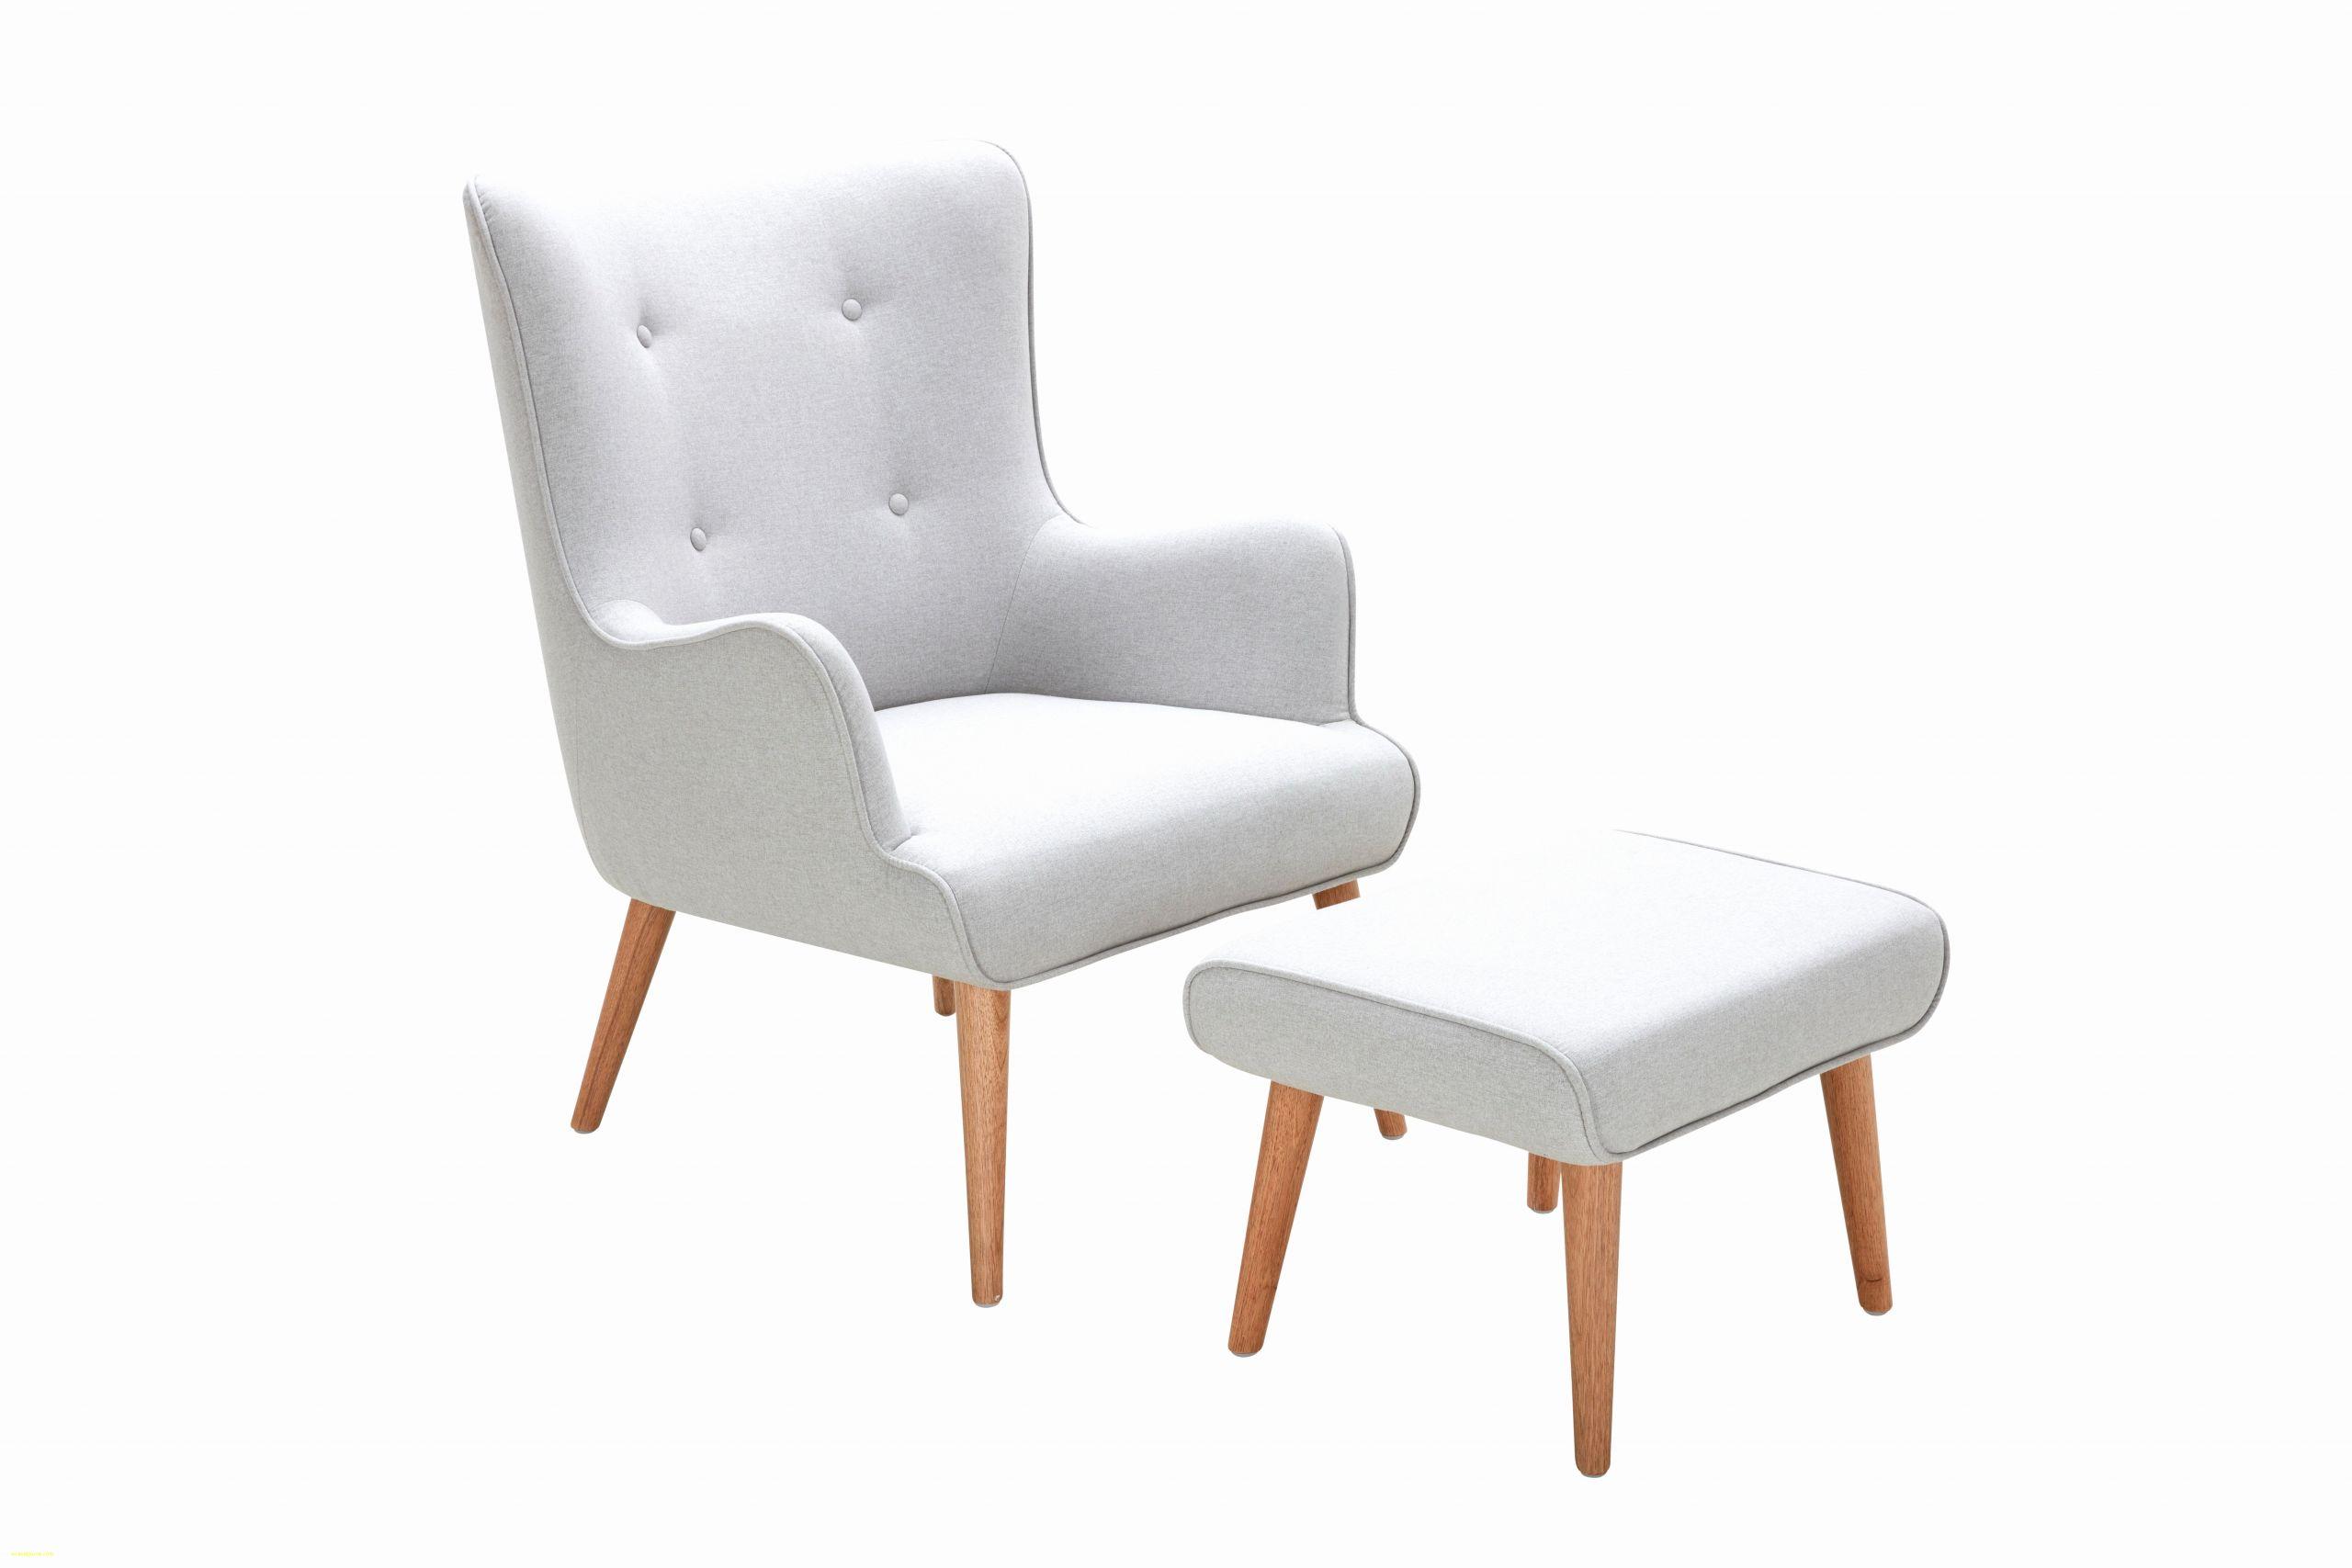 Fauteuil Relax Design Italien Luxe Lit De Relaxation